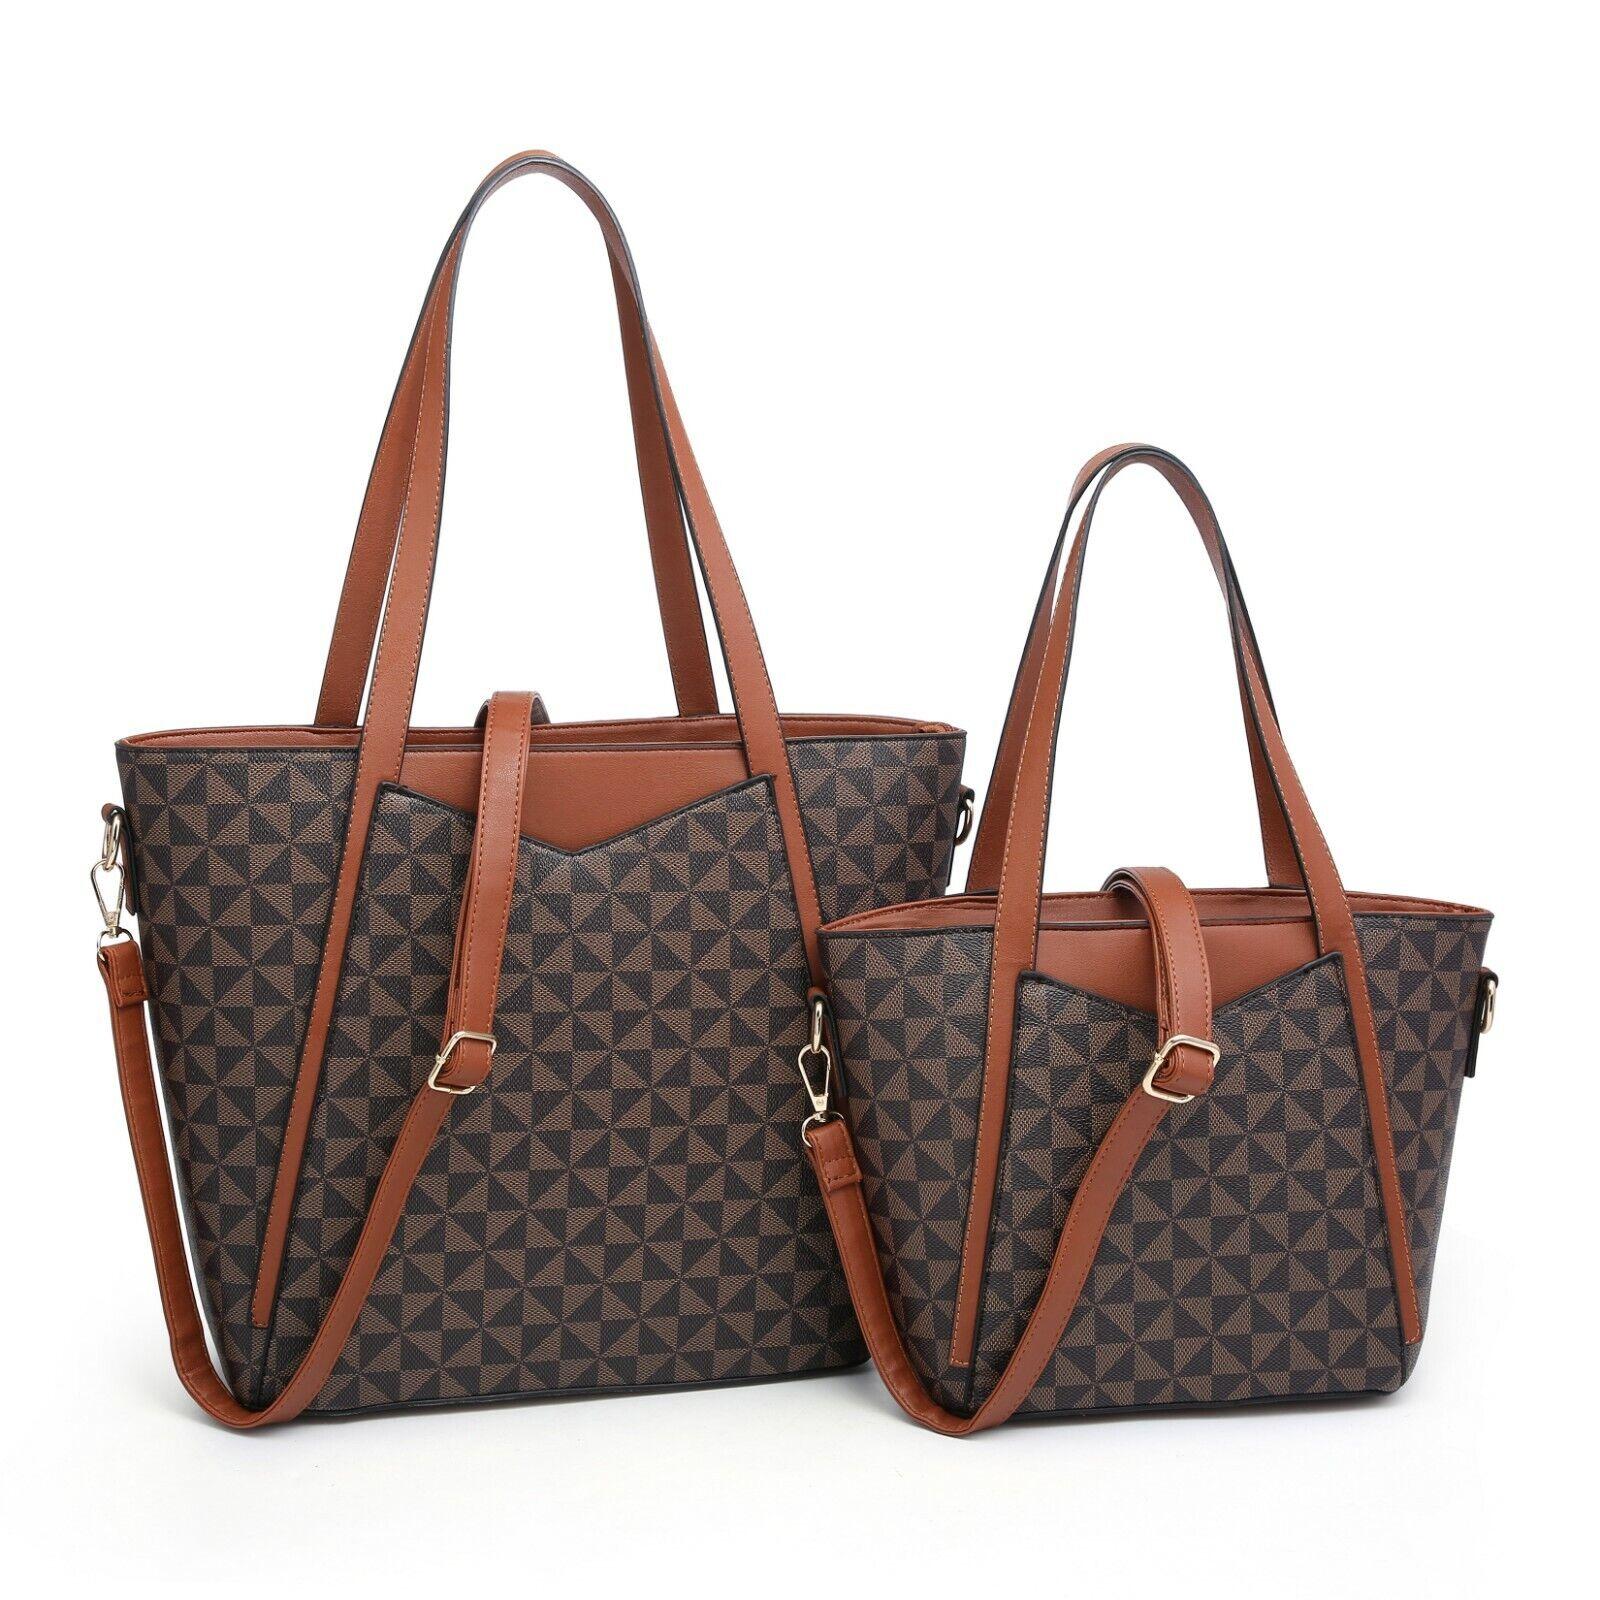 Women's Lady Satchel 2 Pieces Set Tote Bag Shoulder Handbag/